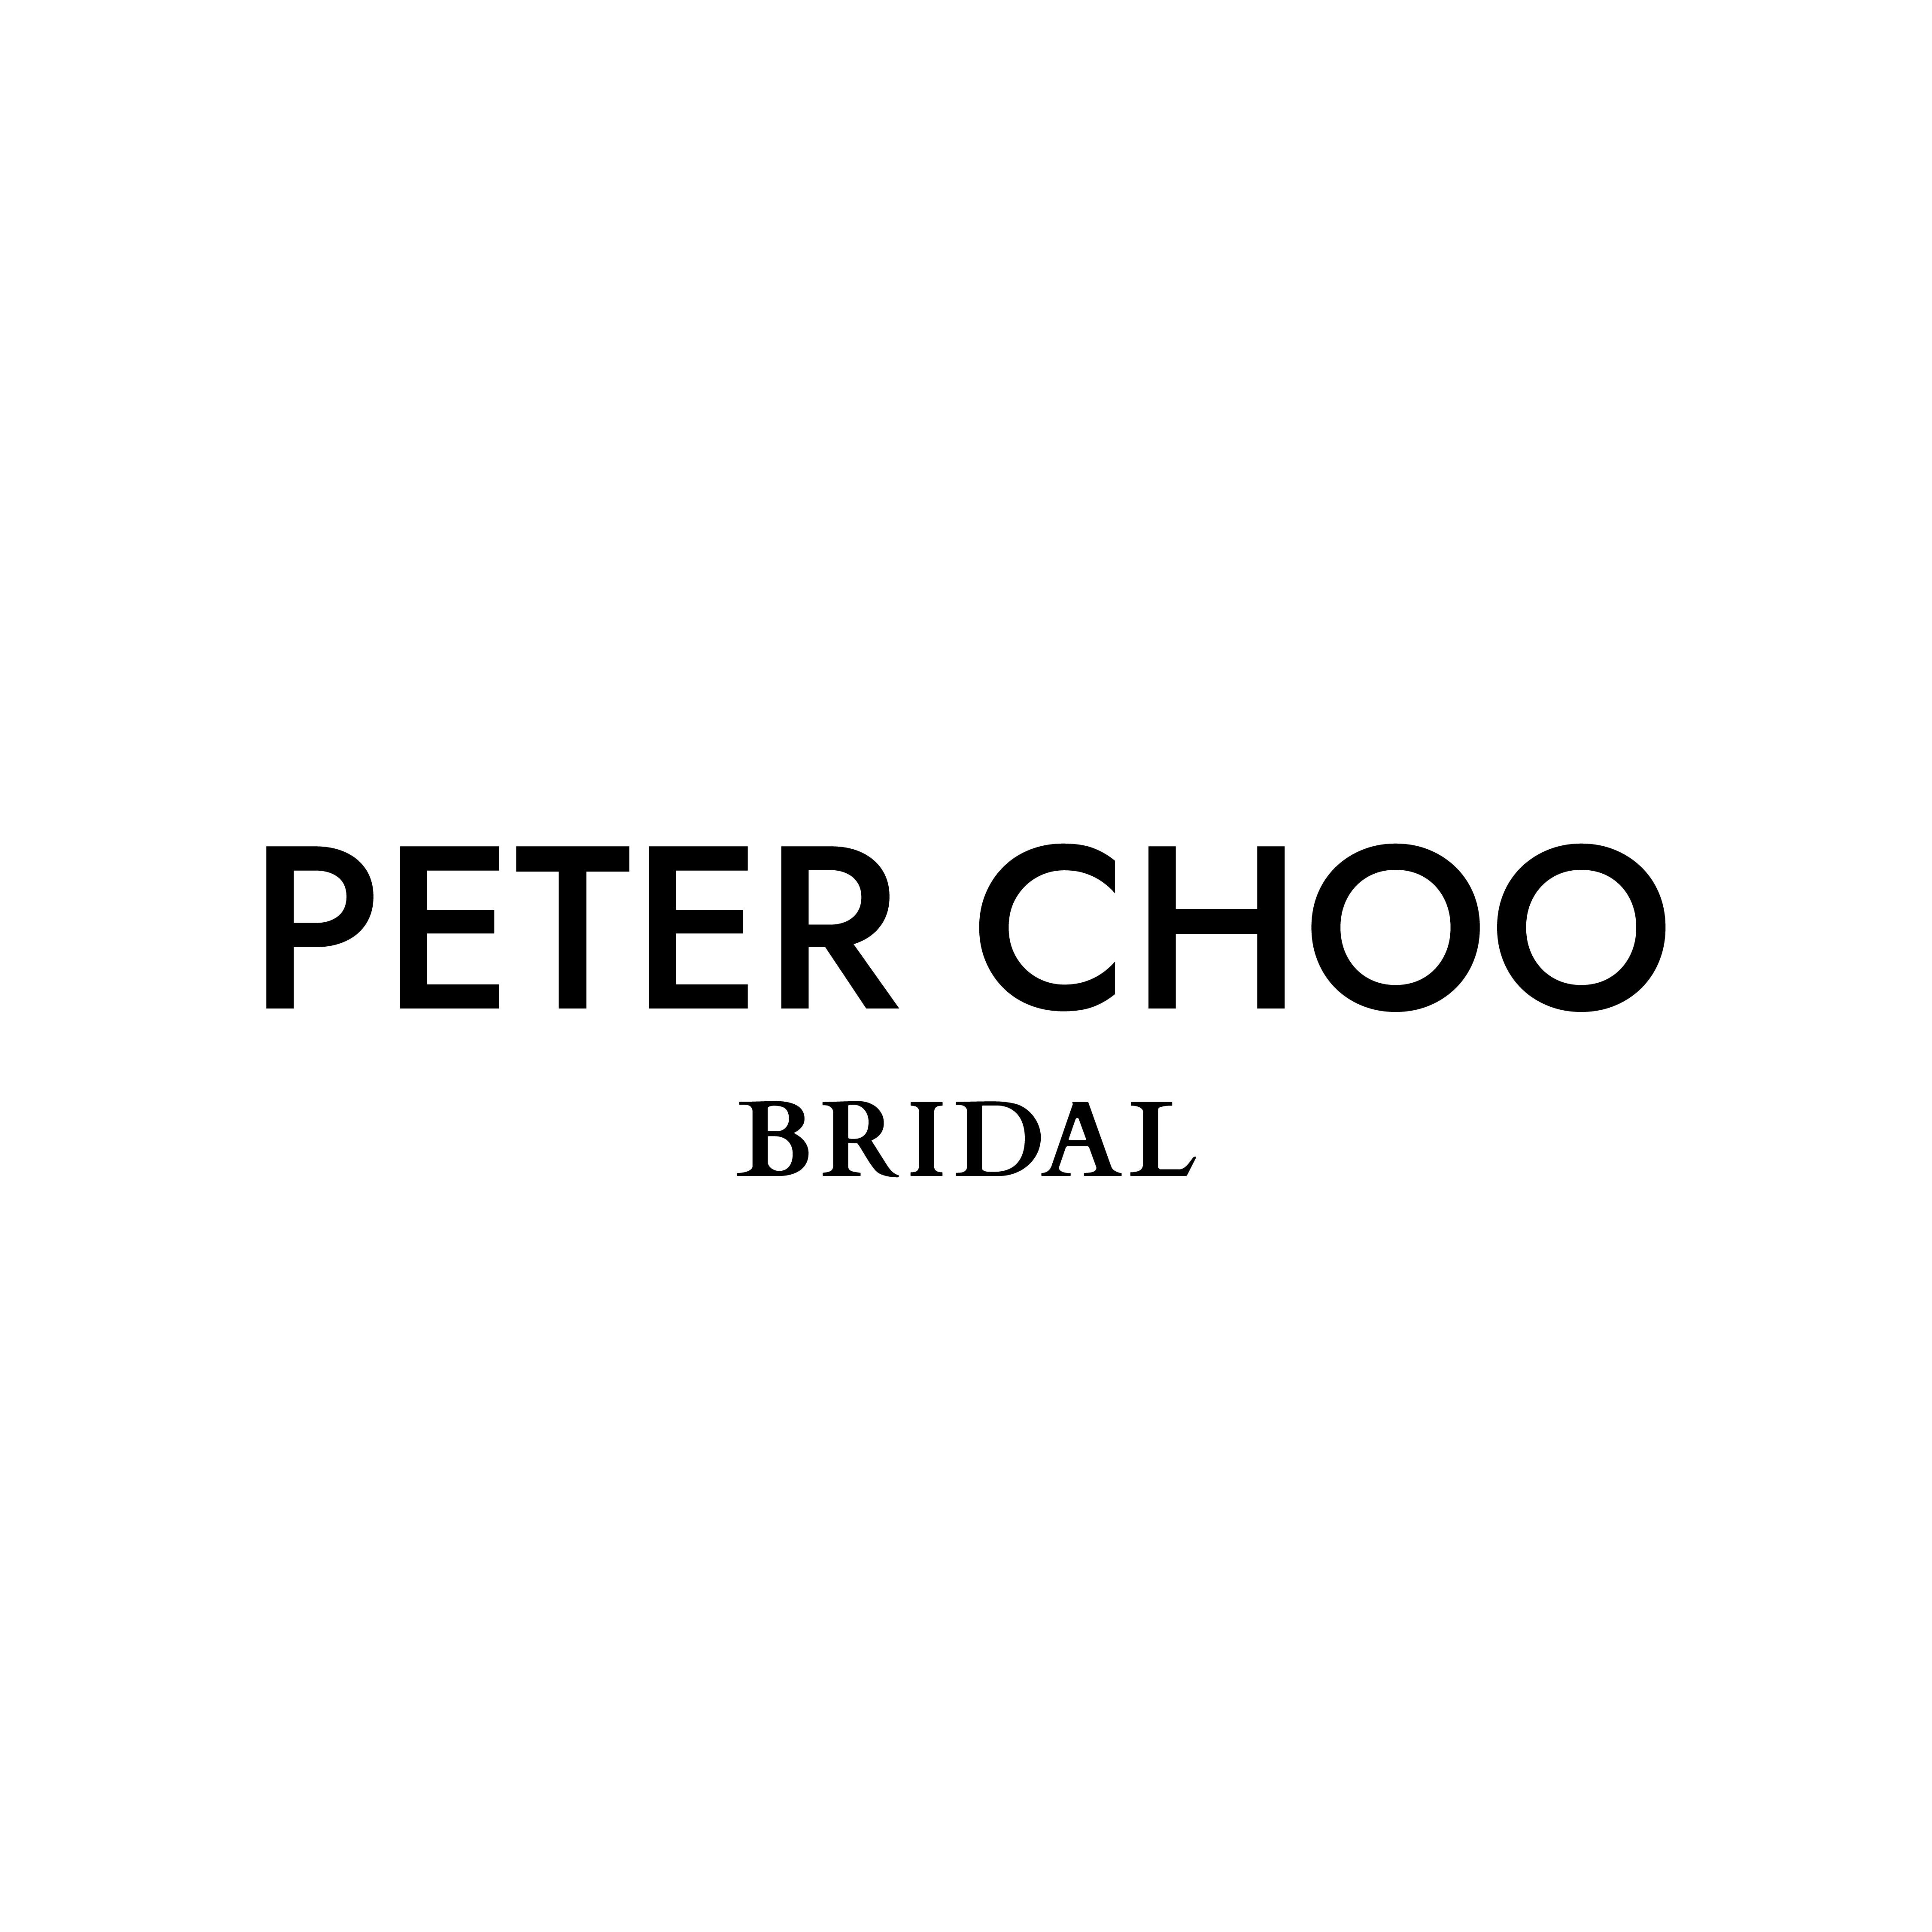 PETER CHOO BRIDAL